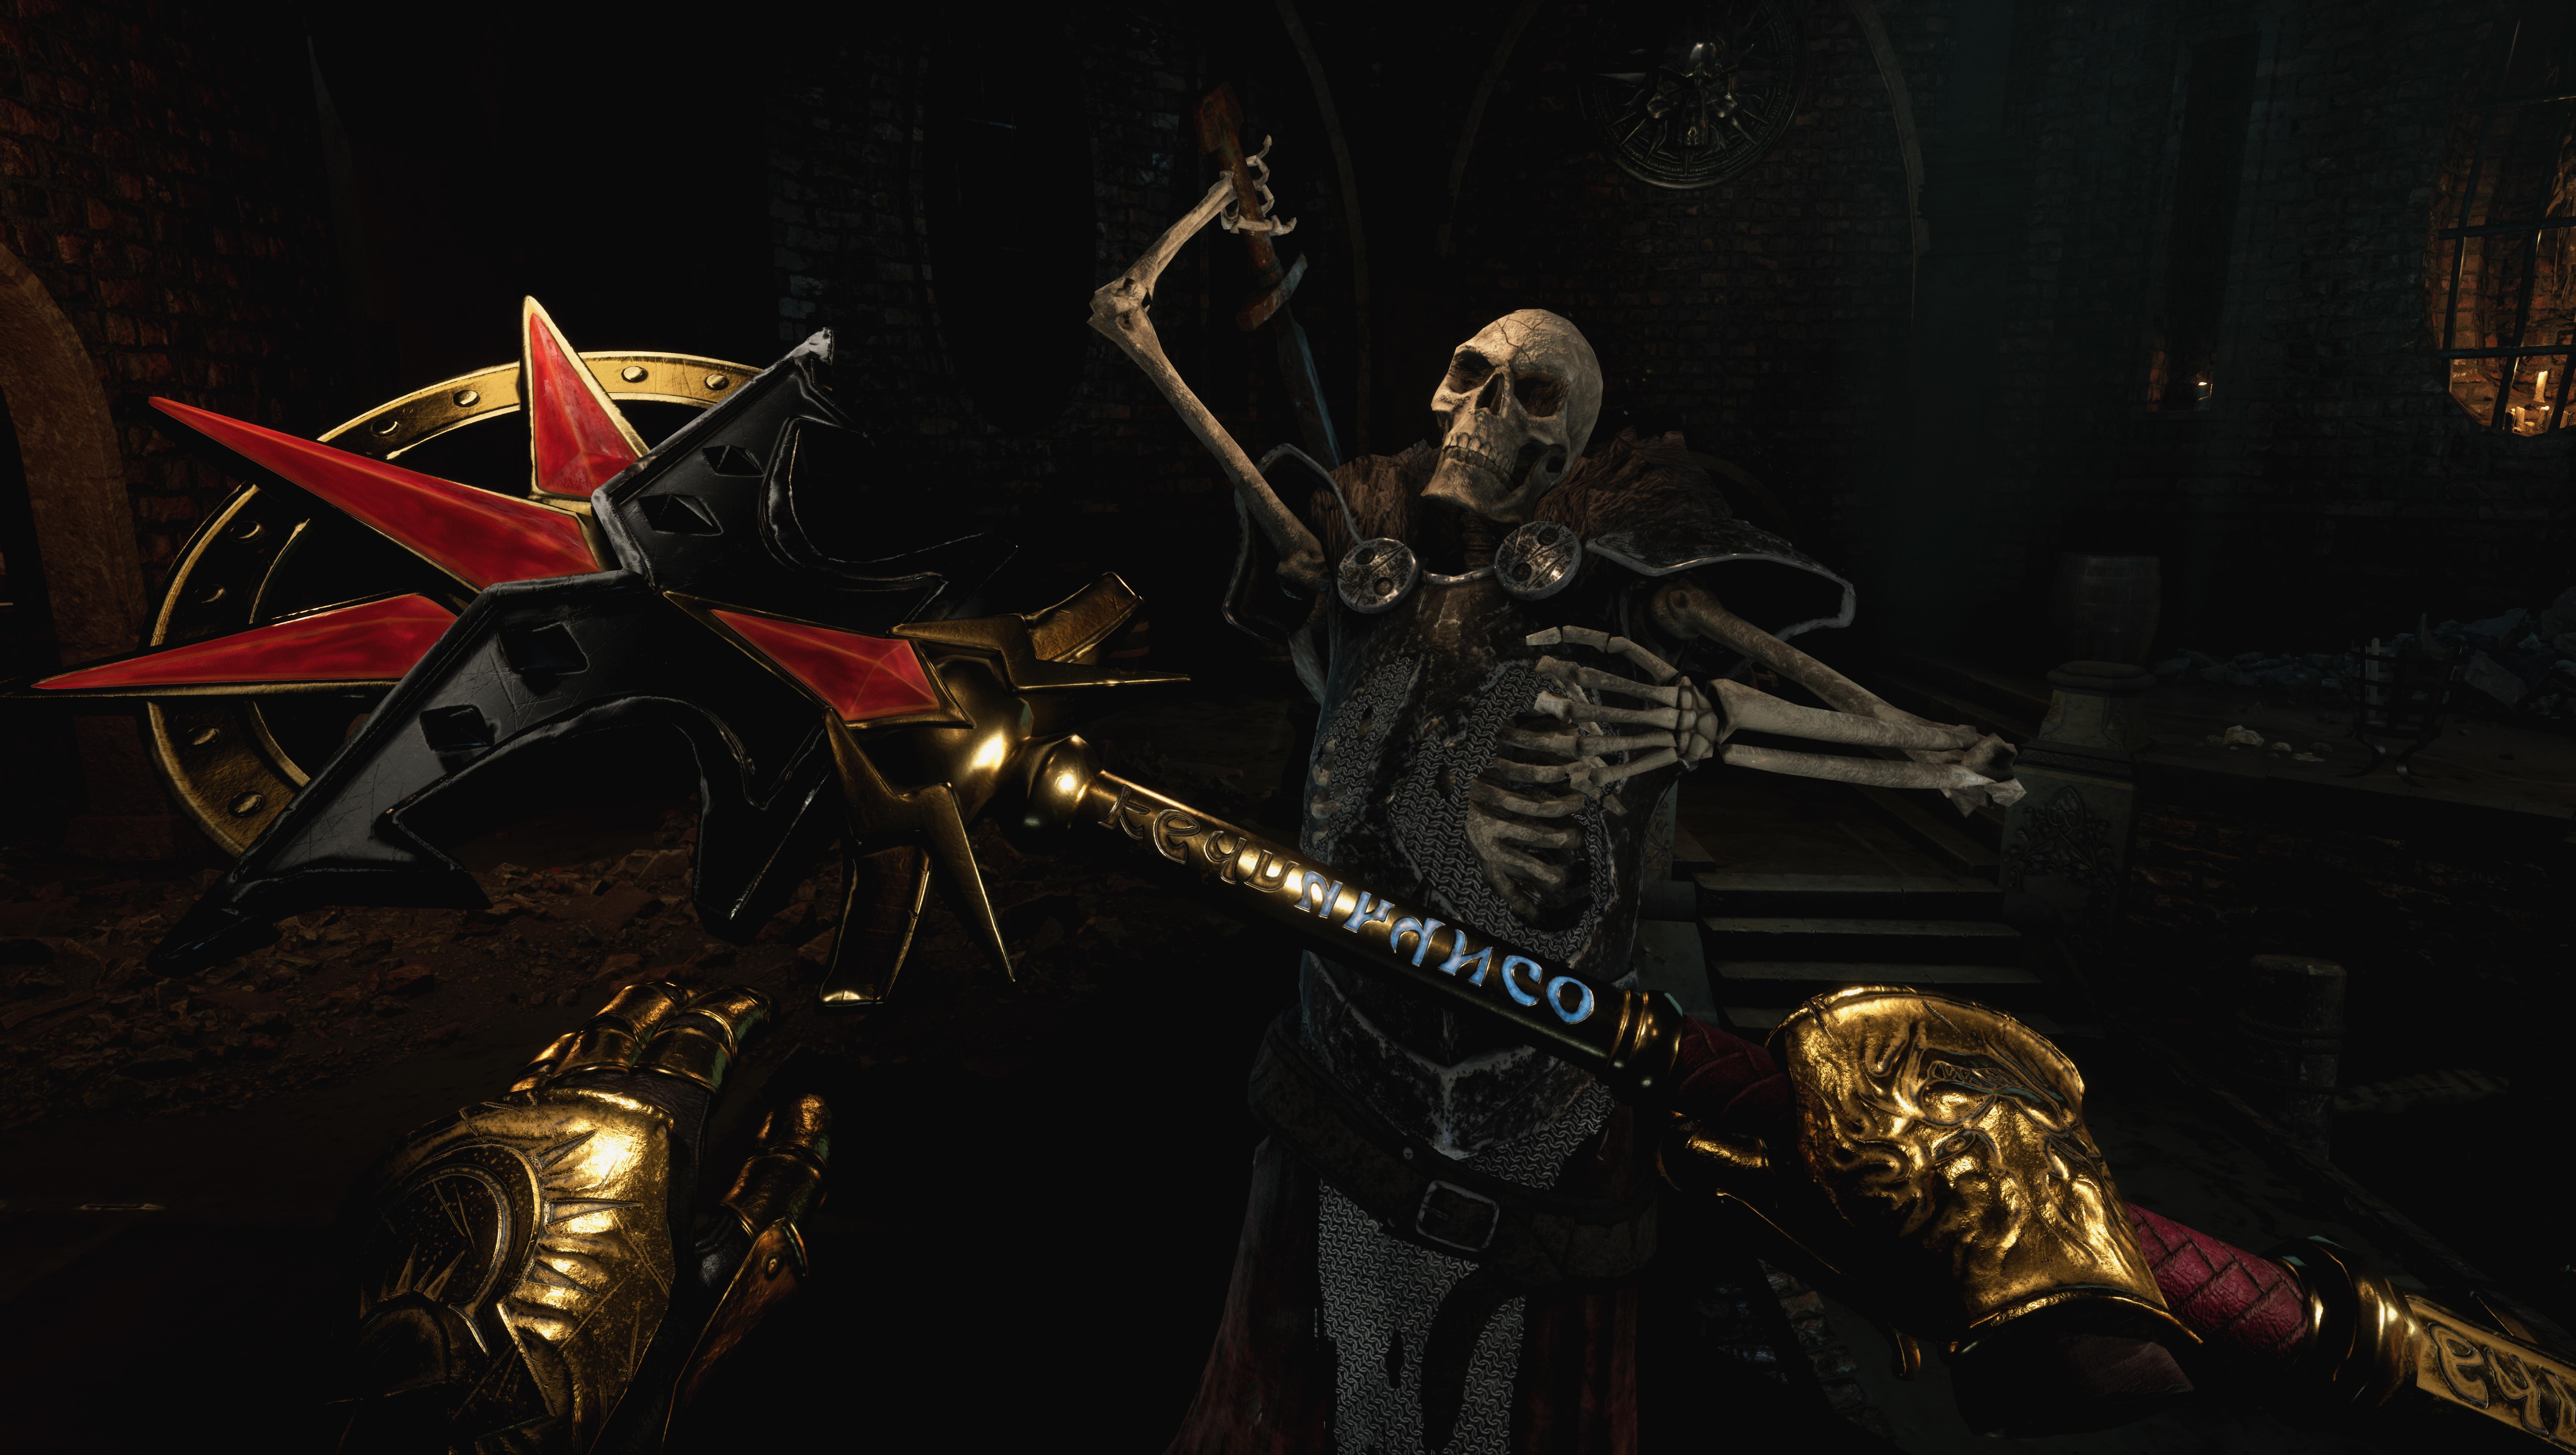 Warhammer-Age-of-Sigmar-Tempestfall_2021_03-25-21_003